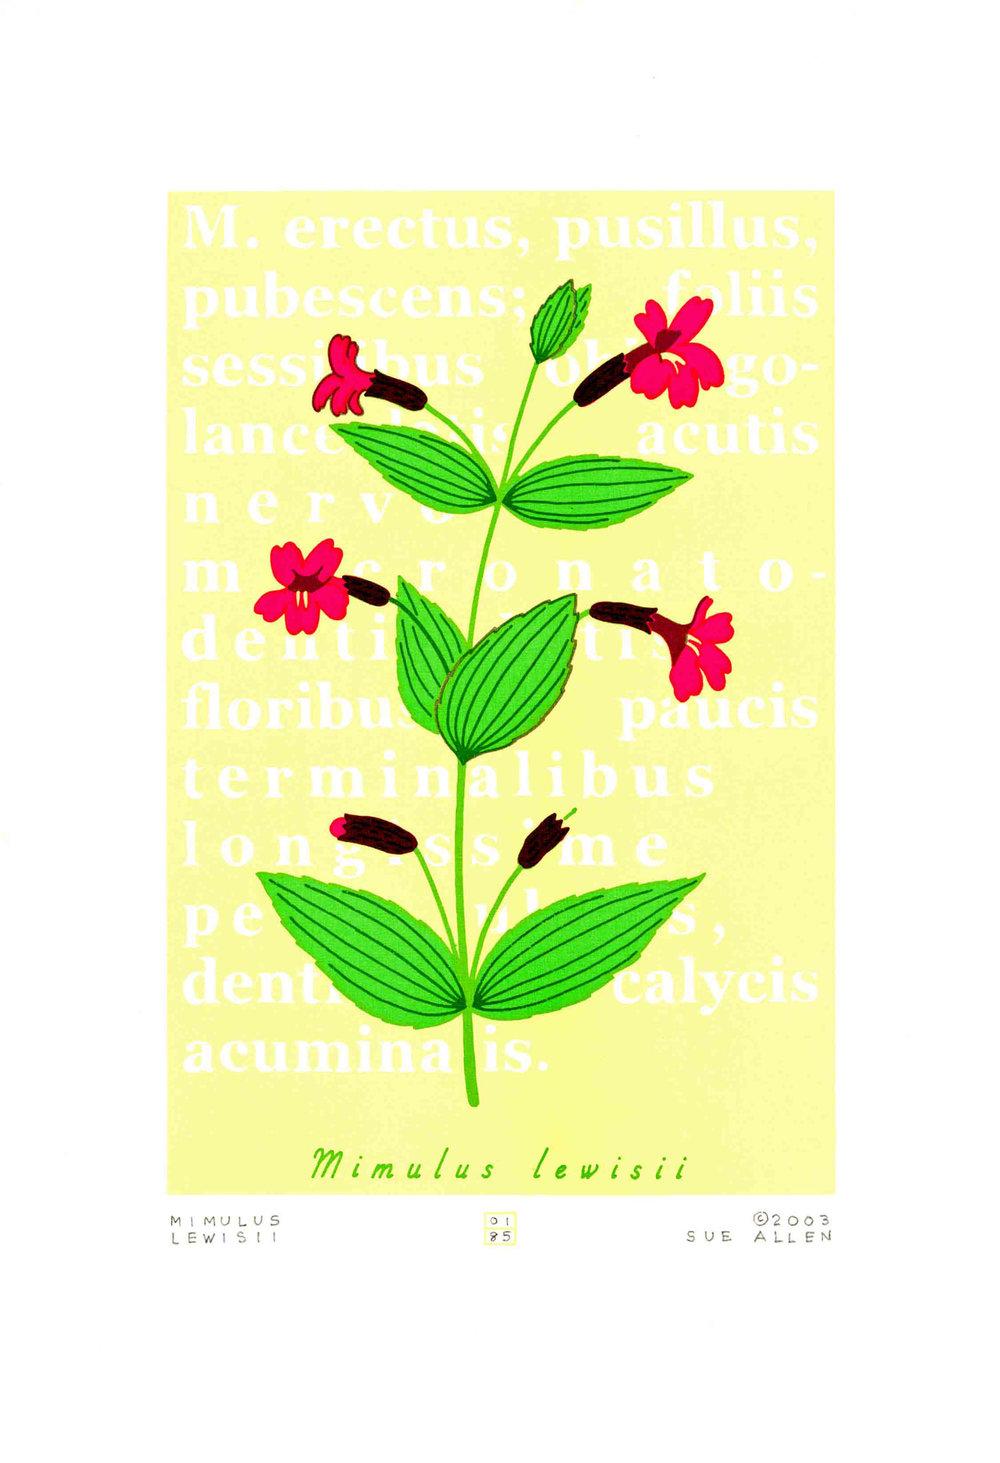 MIMULUS LEWISII- LEWIS' MONKEYFLOWER